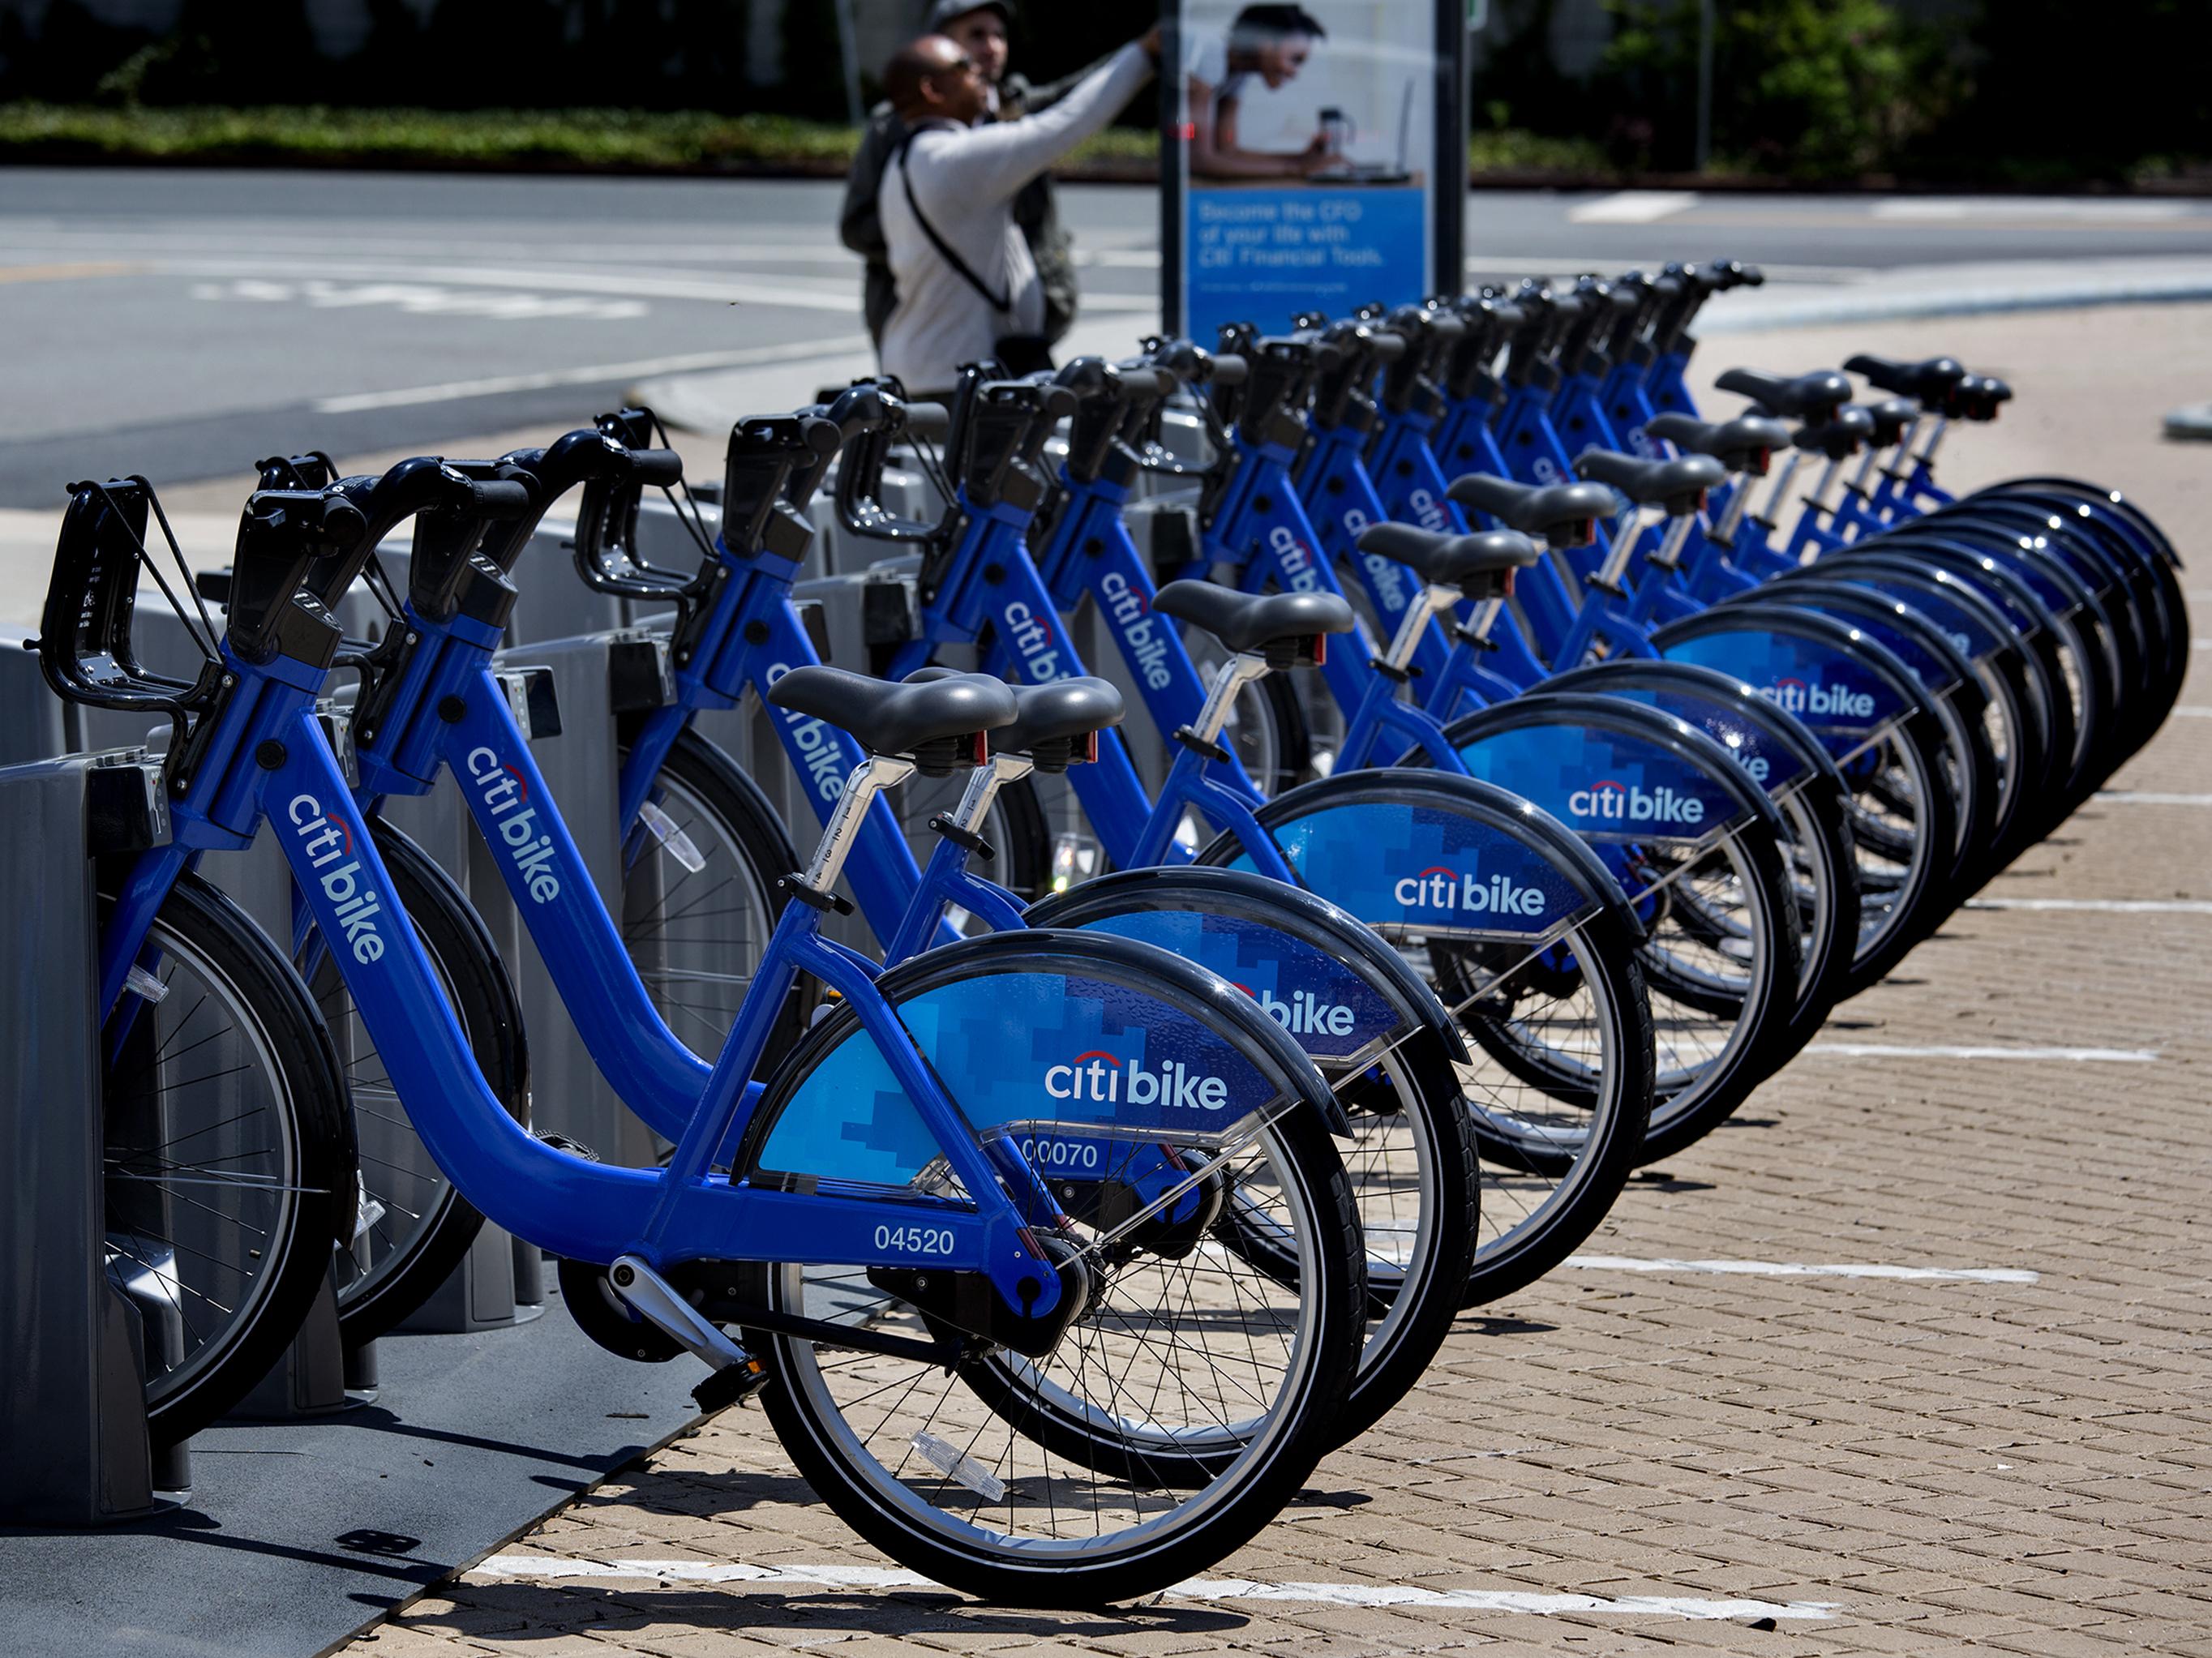 Bike Sharing Programs Roll Into Cities Across The U S Npr